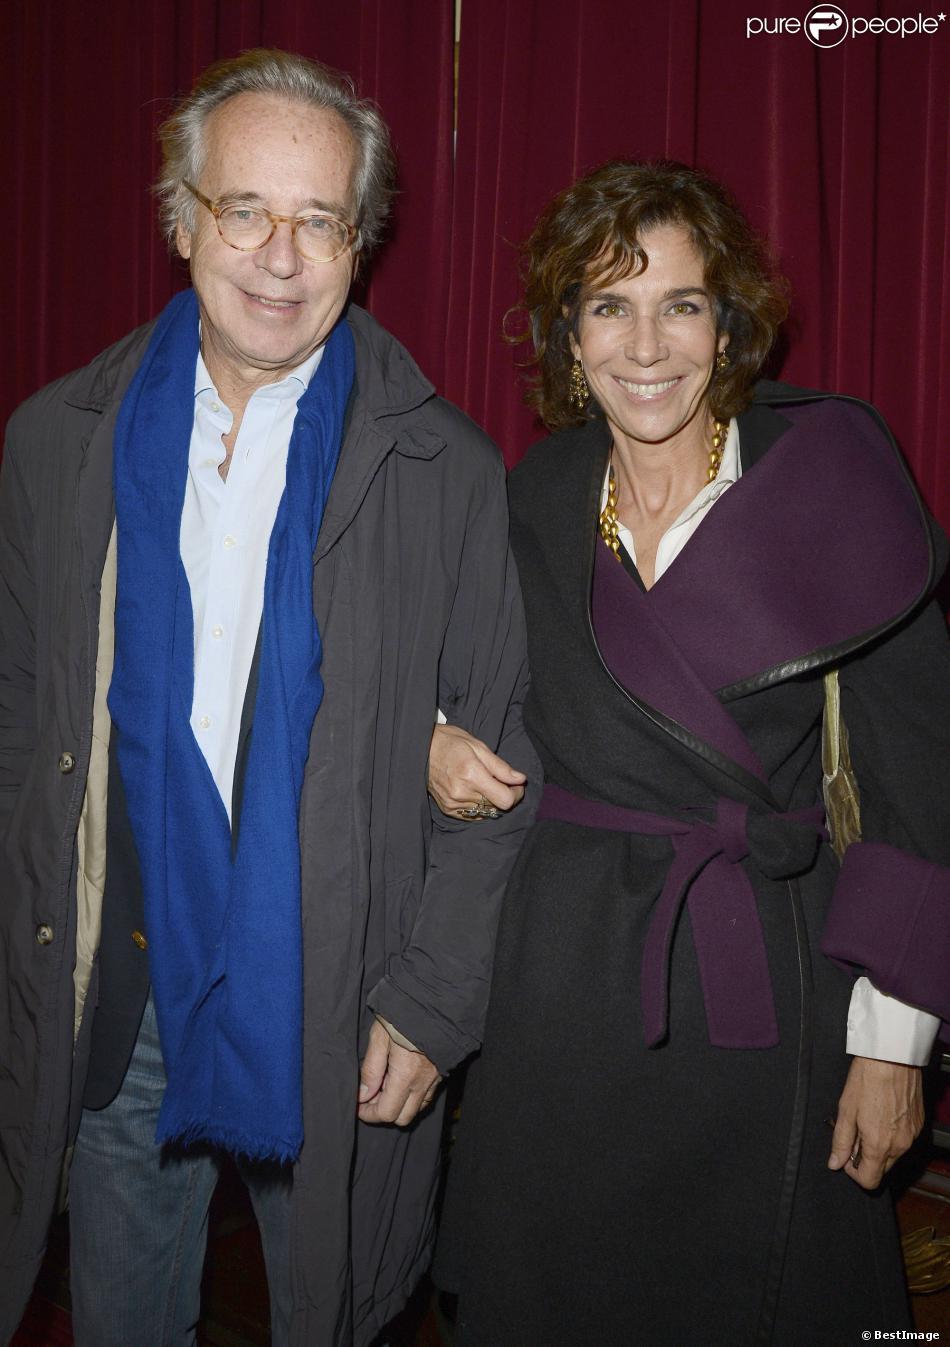 Olivier orban et sa femme christine orban la g n rale de la pi ce la porte c t au th tre - Piece de theatre la porte a cote ...